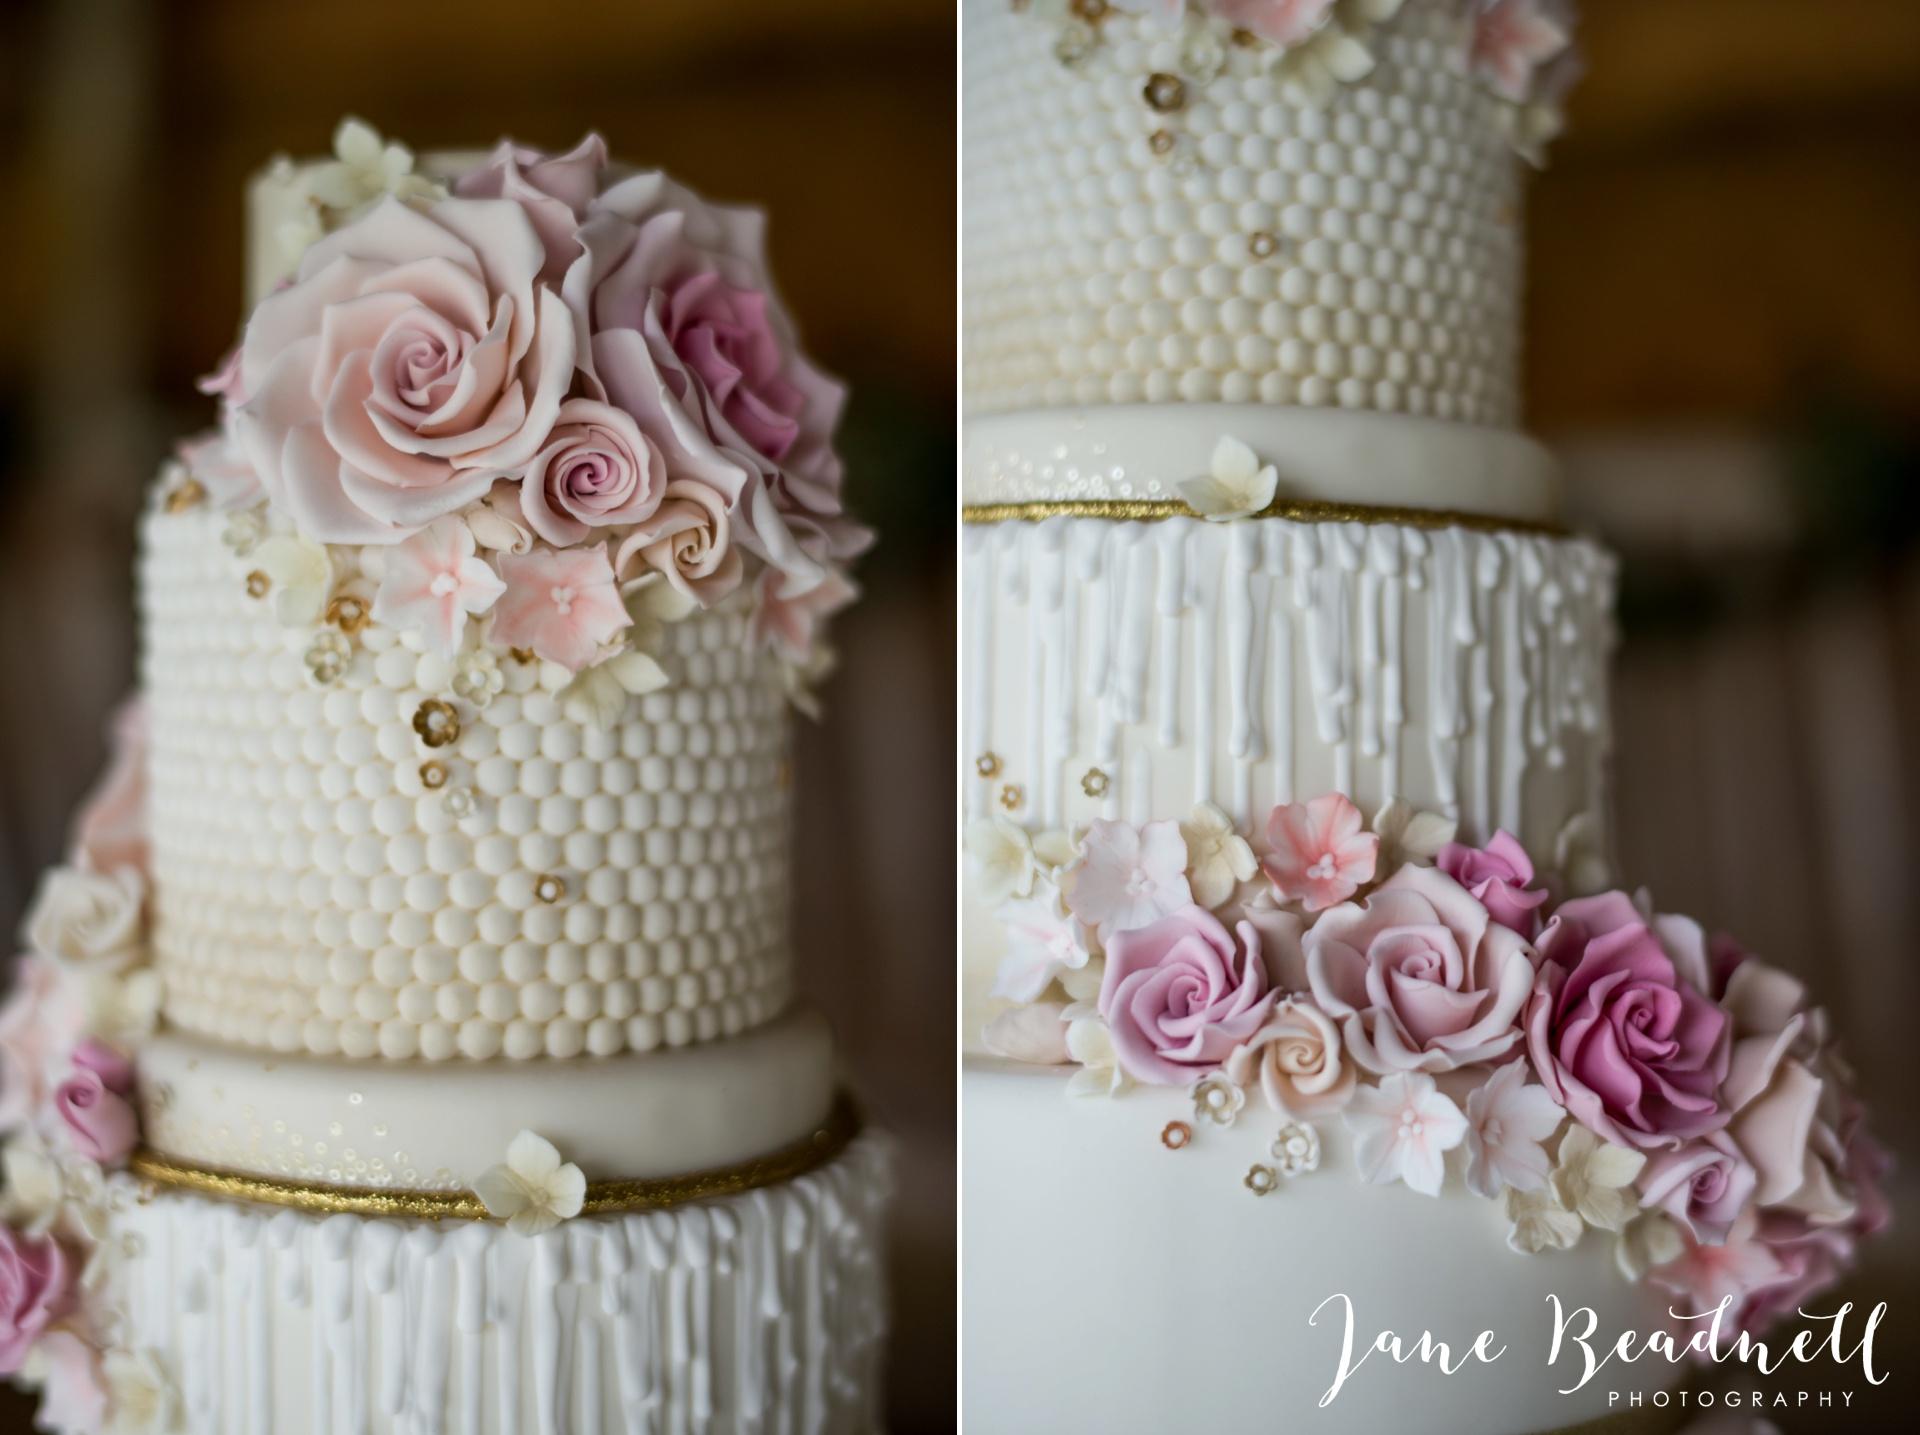 Jane Beadnell fine art wedding photographer Swinton Park5